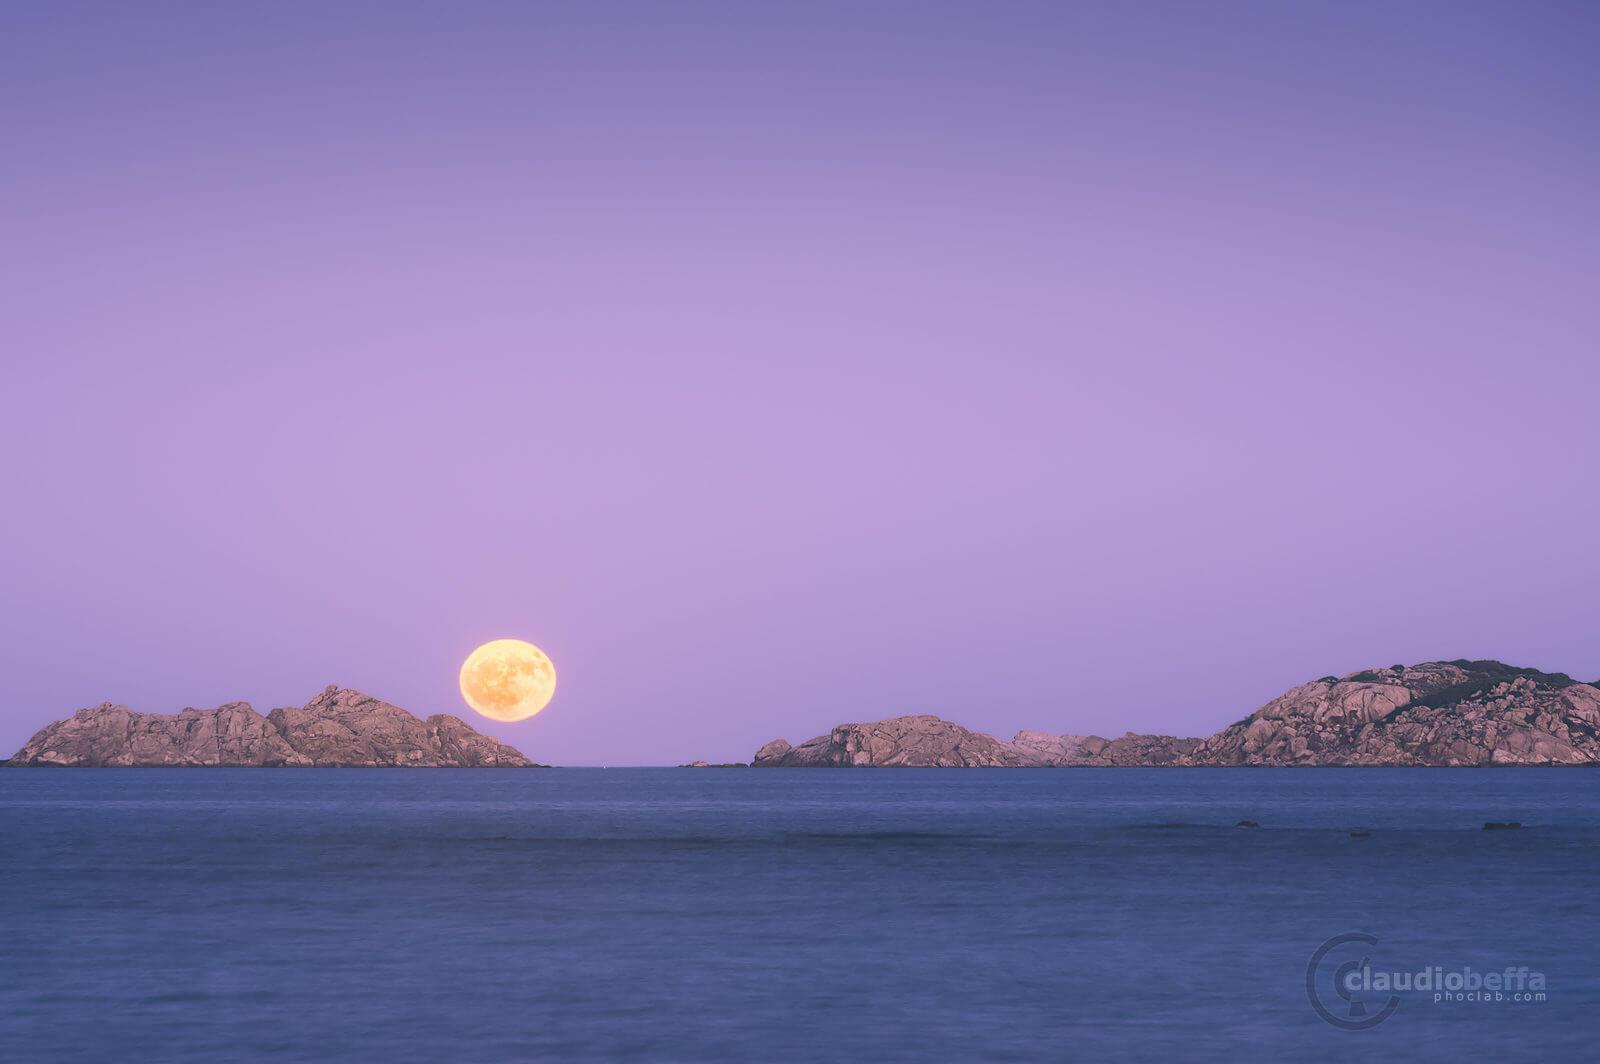 full moon, Serpentara, Sardinia, Italy, twilight, island, sea, moon, seascape